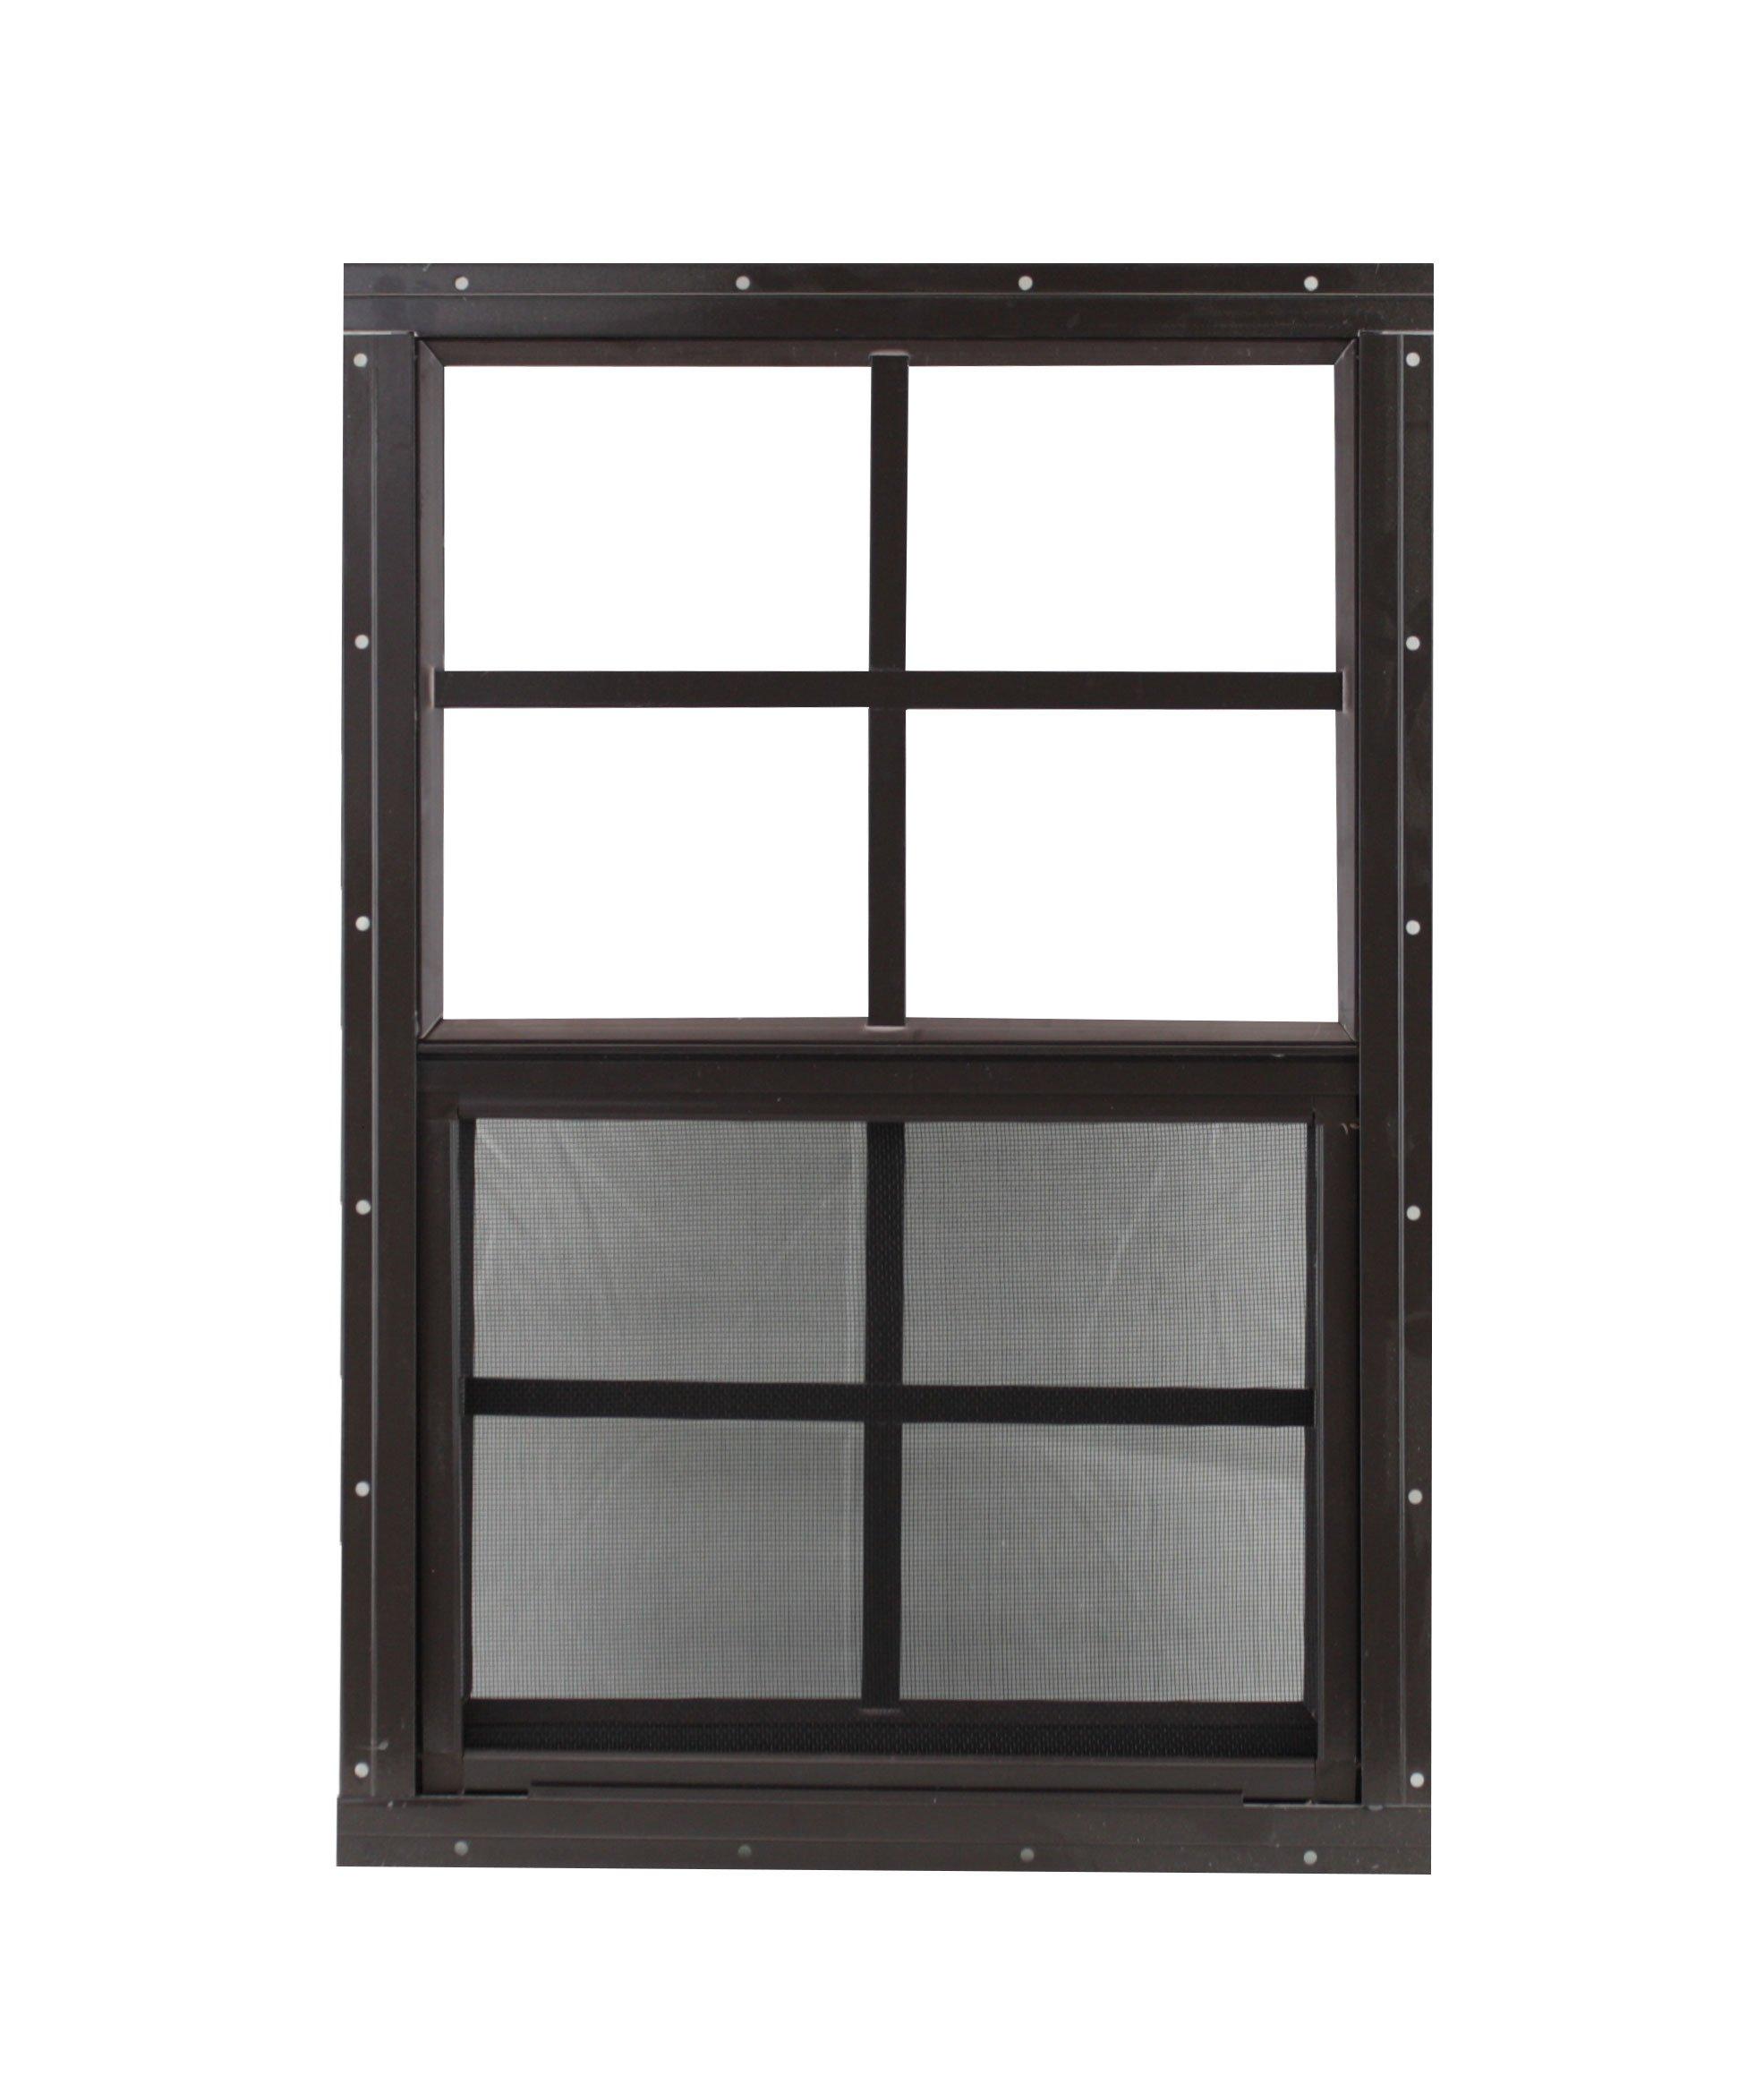 Play House Window 12 x 18 Brown Flush, Chicken Coop Window,Shed Window